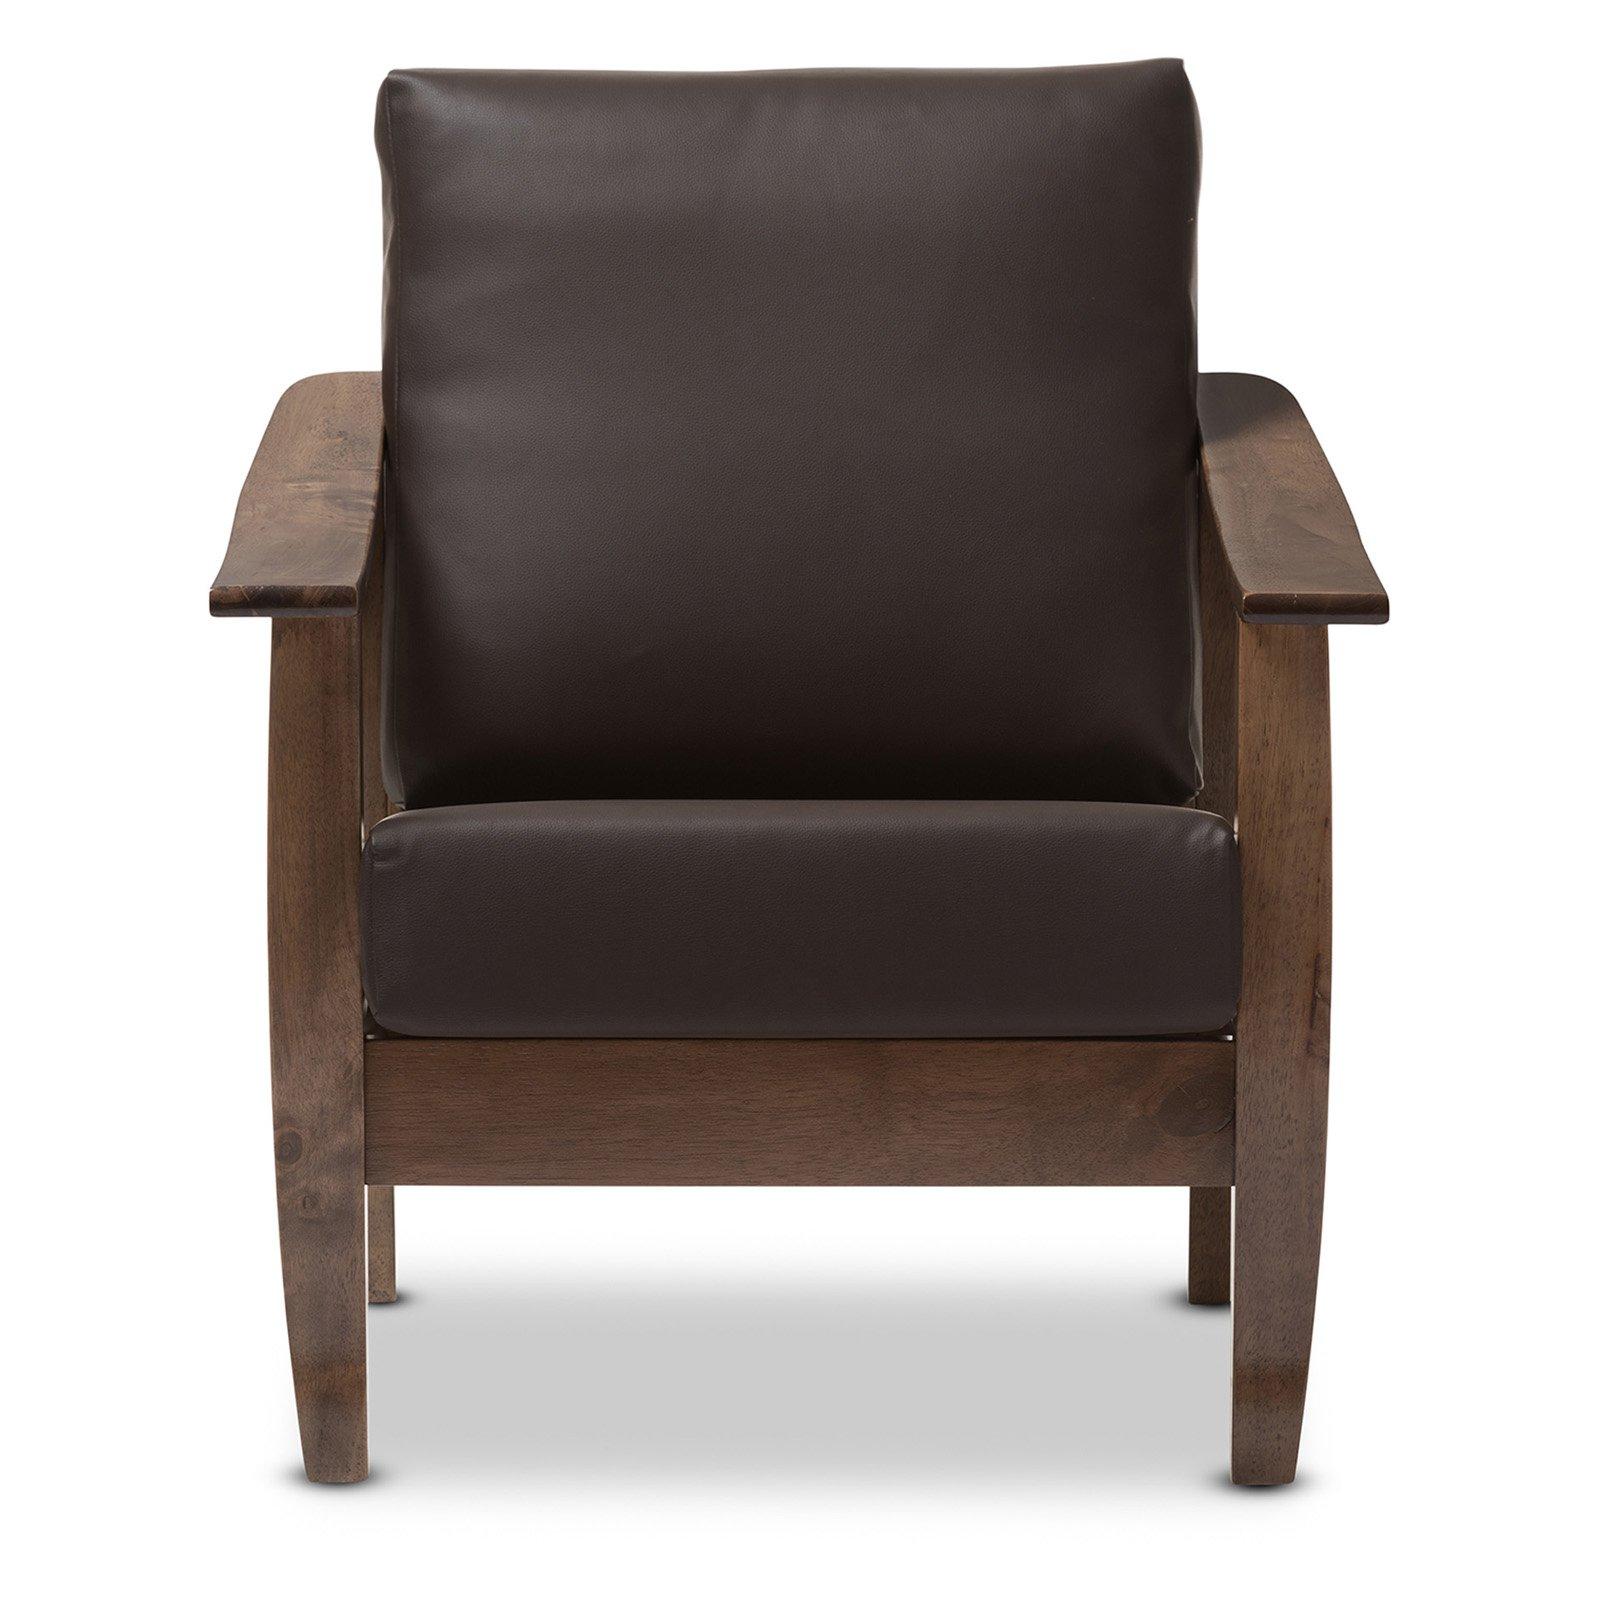 Baxton Studio Pierce Lounge Chair by Baxton Studio